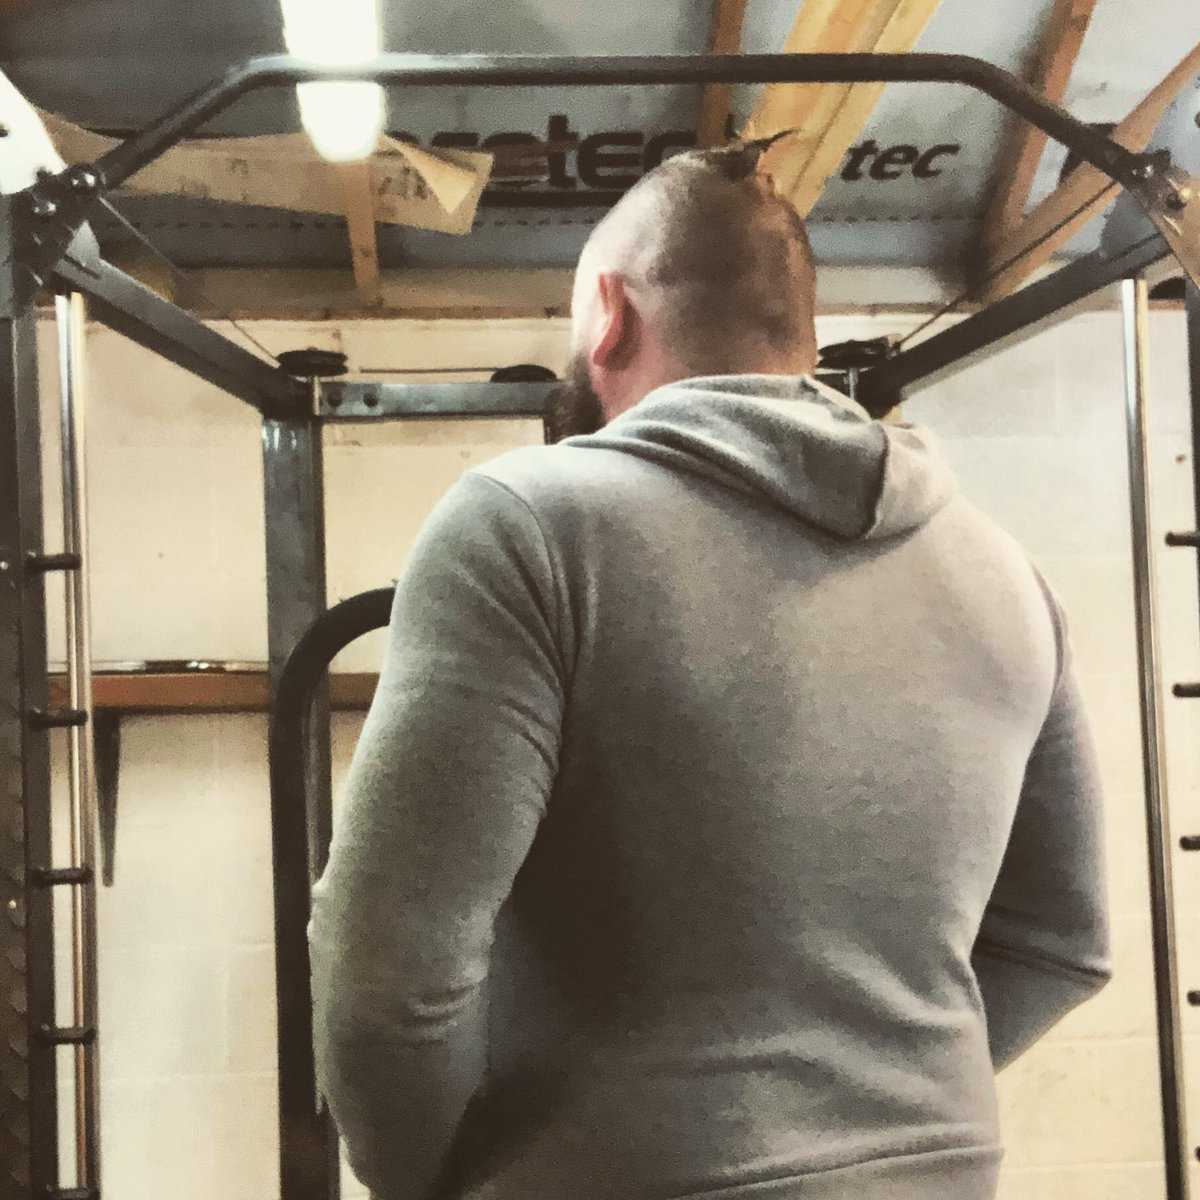 #instafit #homefitness #healthy #bodyweightworkout #fitlife #yoga #hiit #workoutroutine #fitnessgirl #quarantineworkout #fitmom #strong #legday #muscle #weightlossjourney #lifestyle #coreworkout #stayhealthy #staysafe #lockdown #fitnessaddict #sport